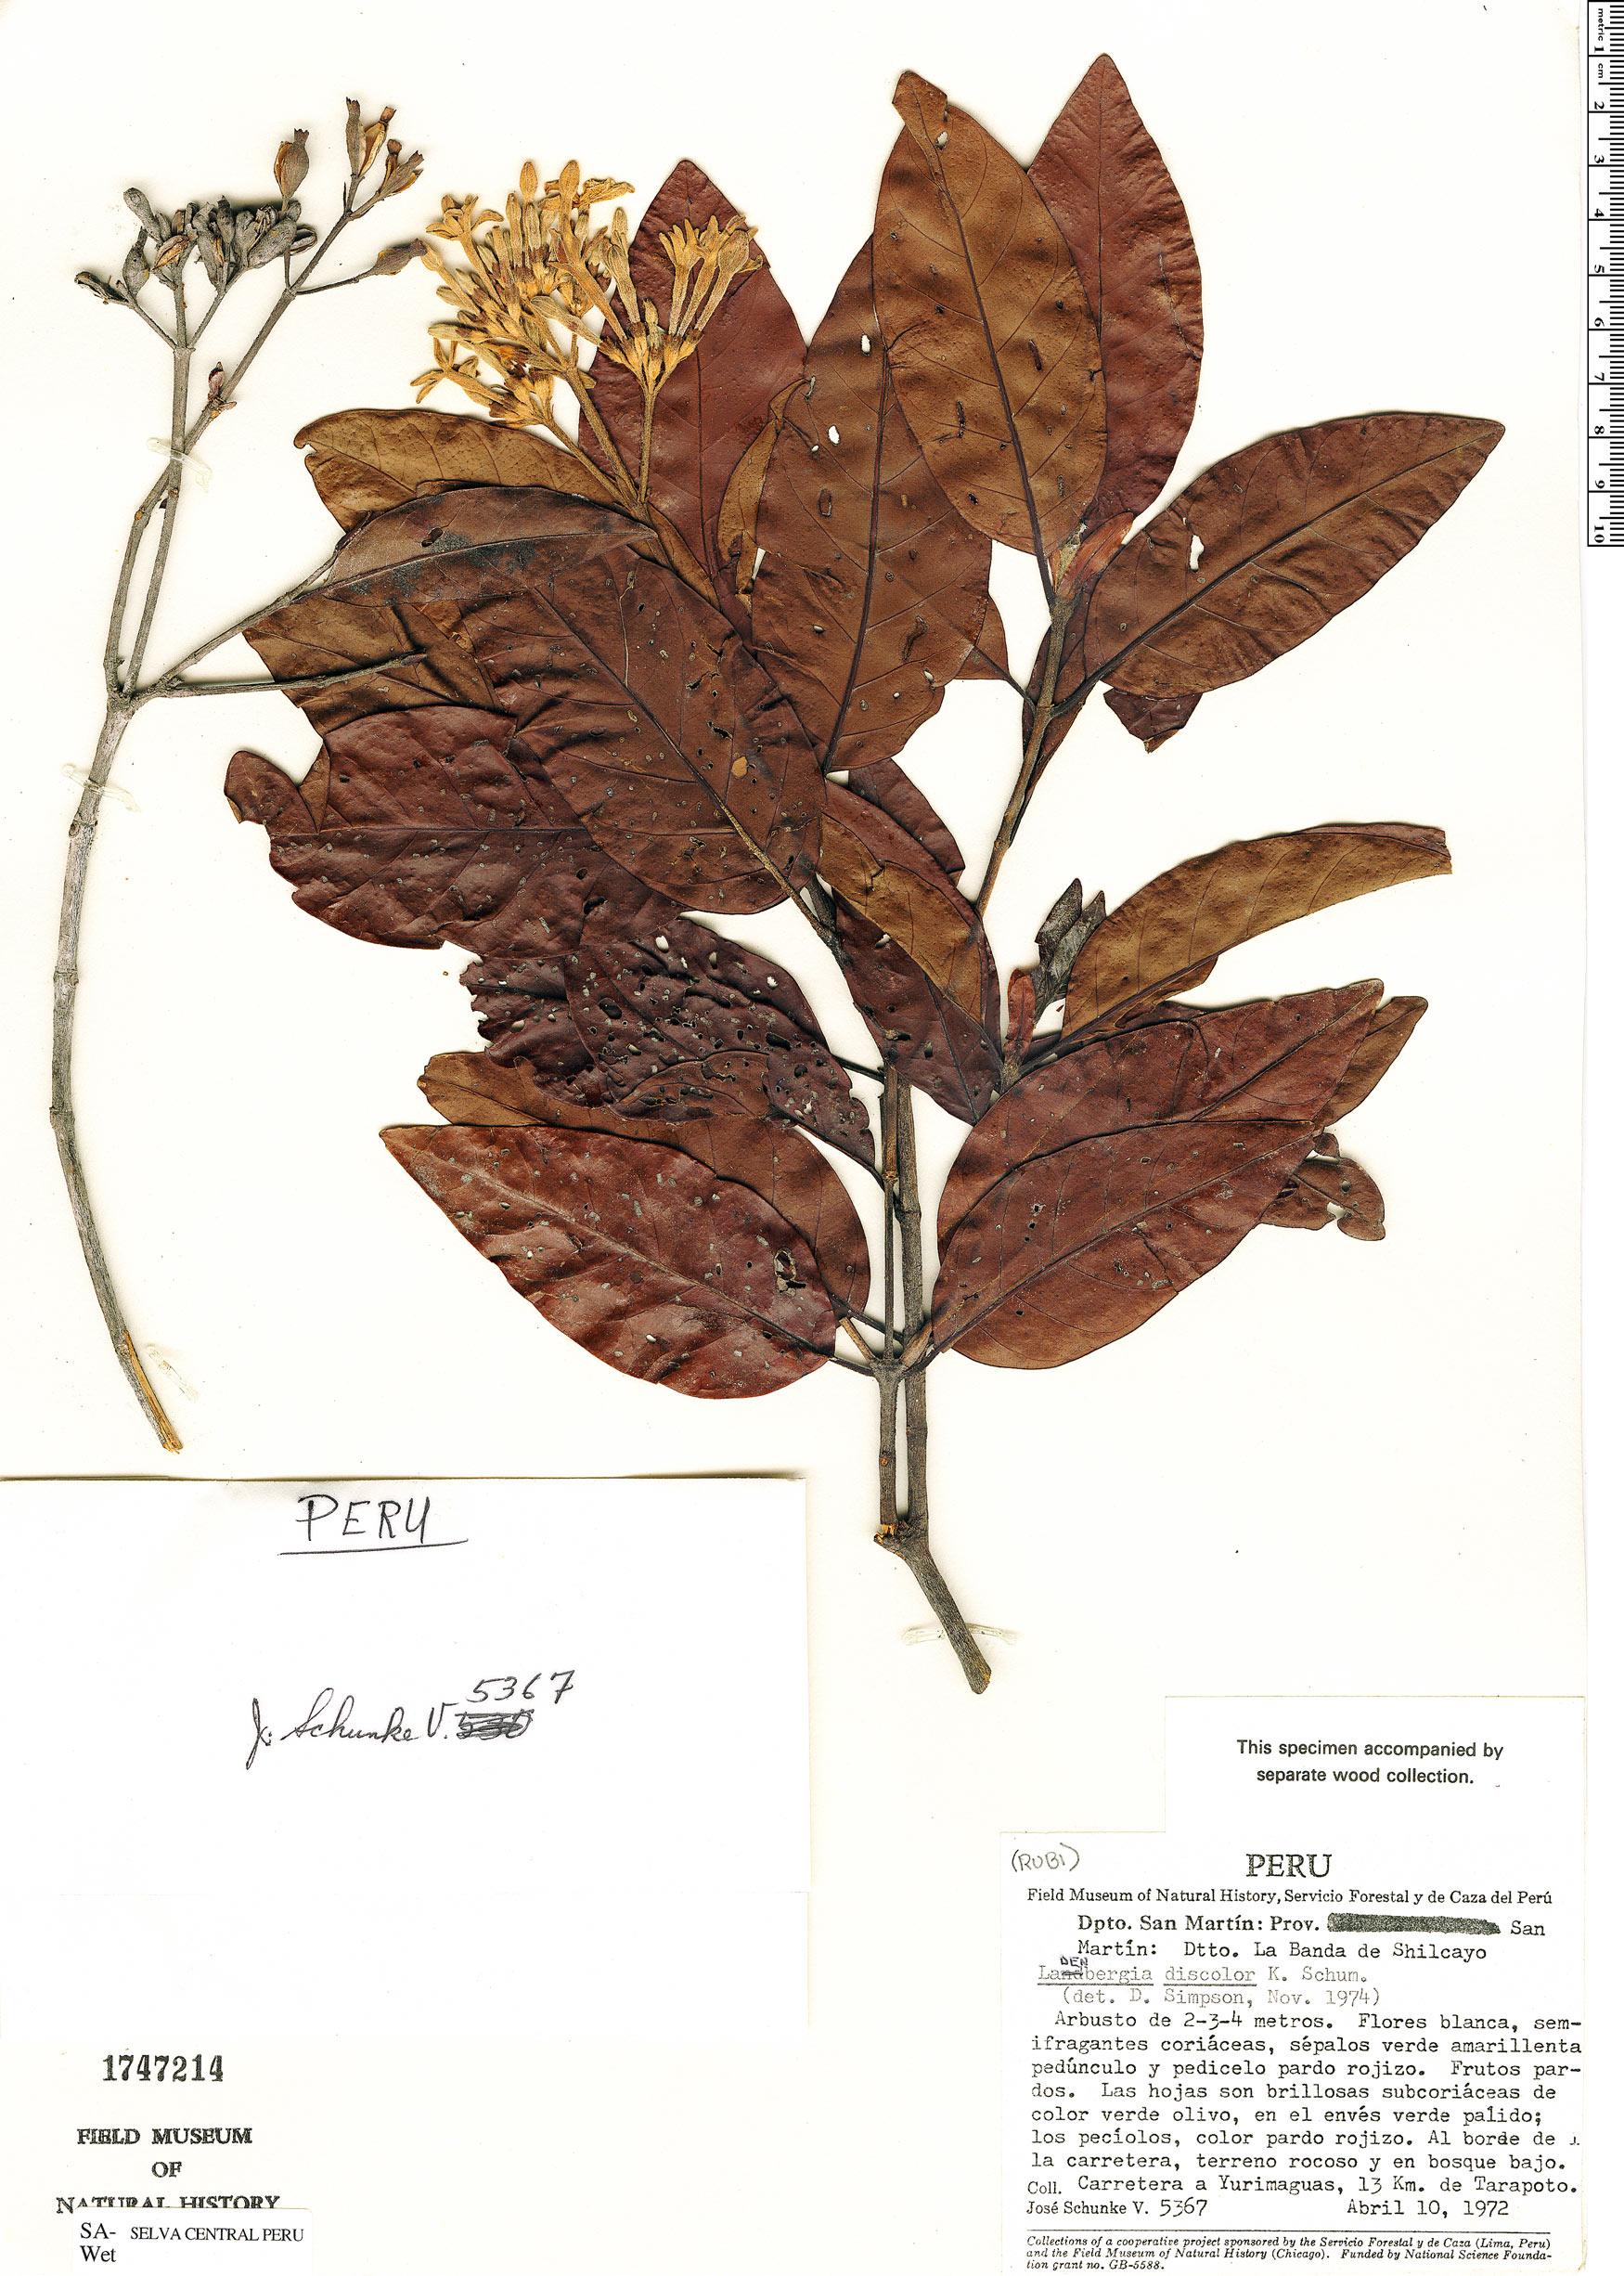 Specimen: Ladenbergia discolor